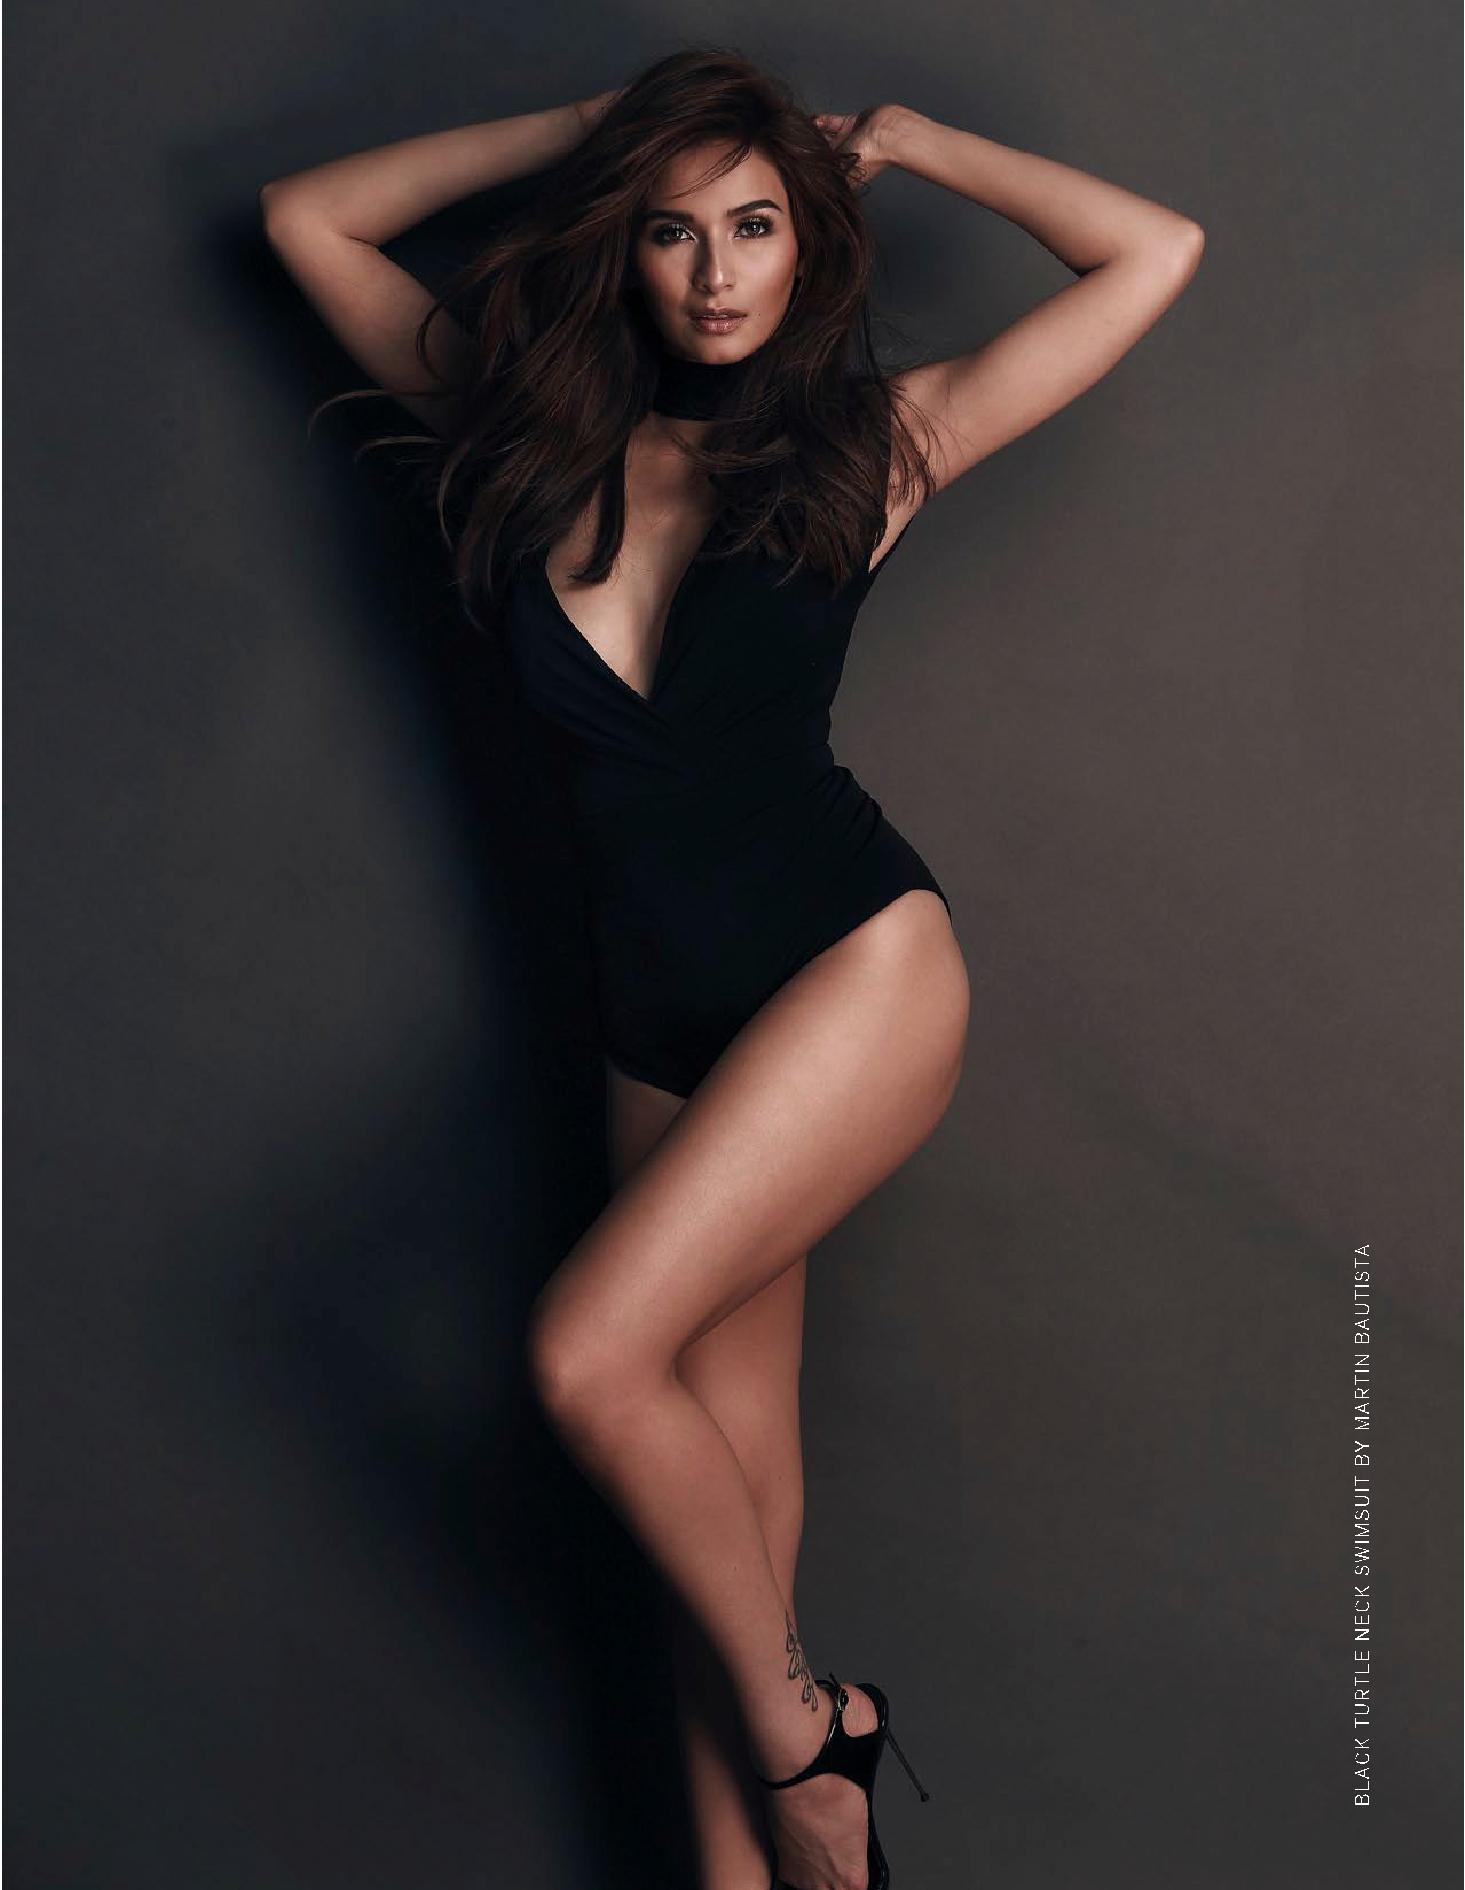 Veena naked photo-3072